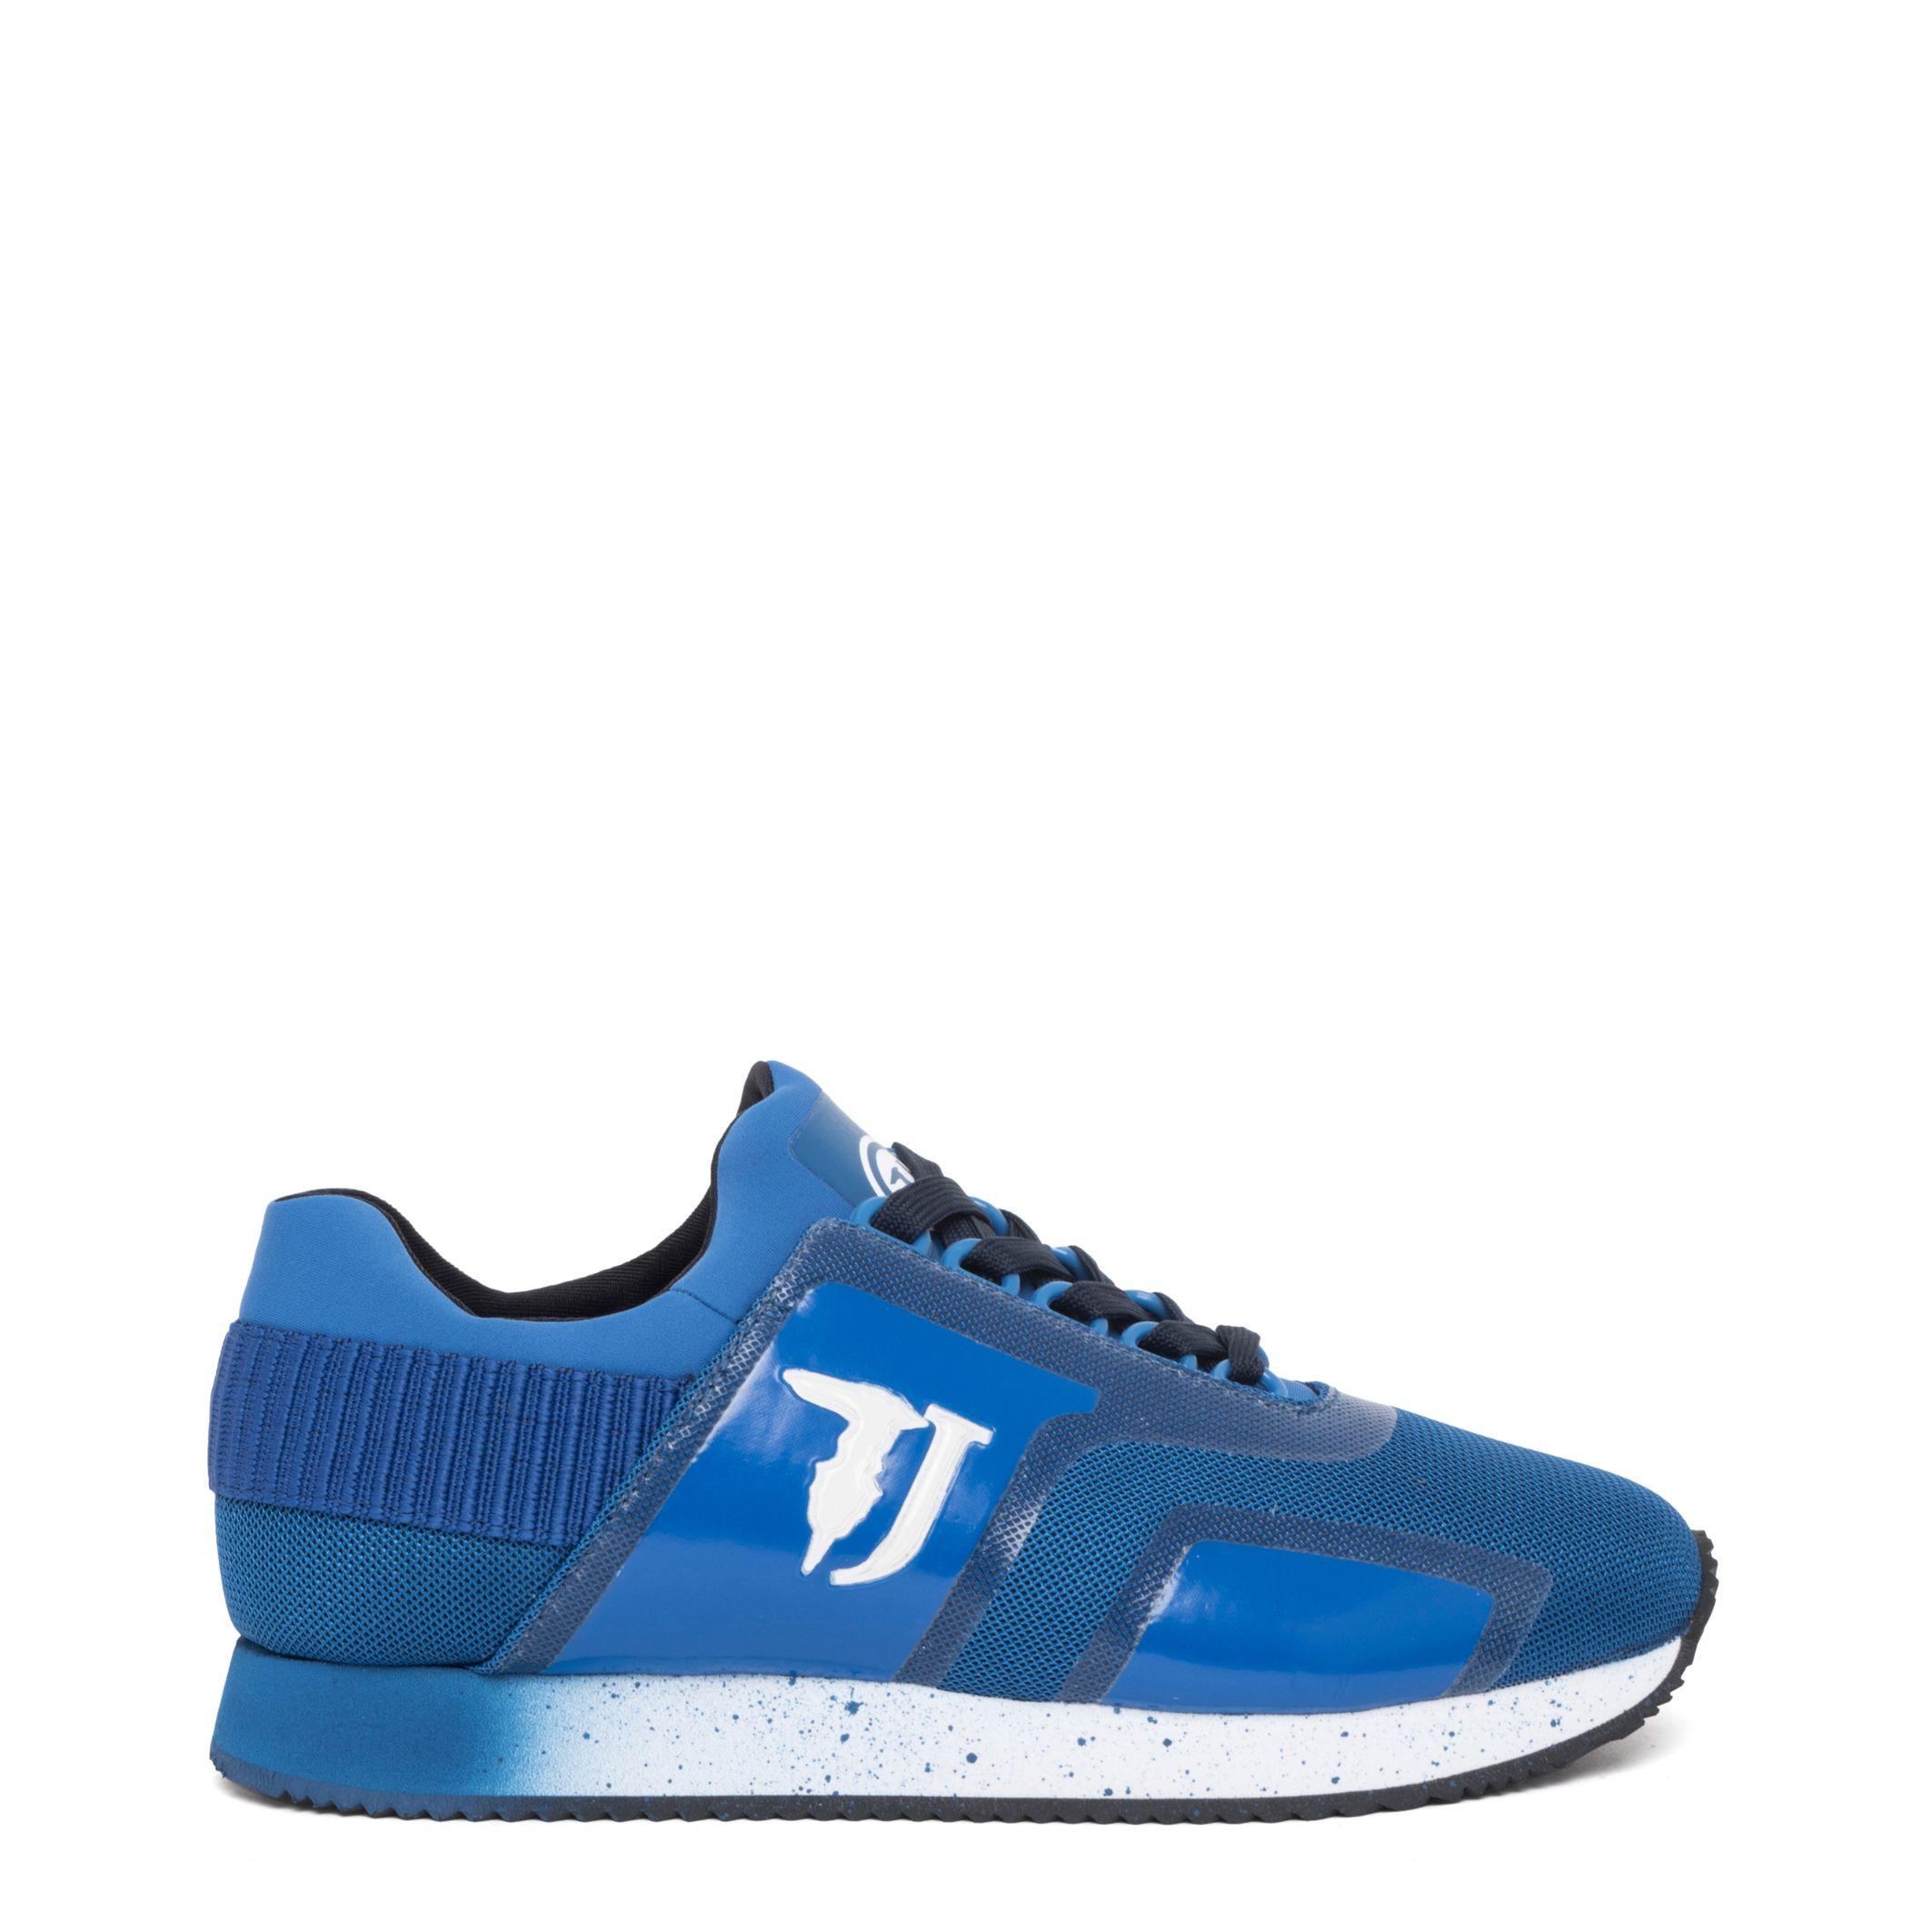 Trussardi – 77A00154 – Blauw Designeritems.nl